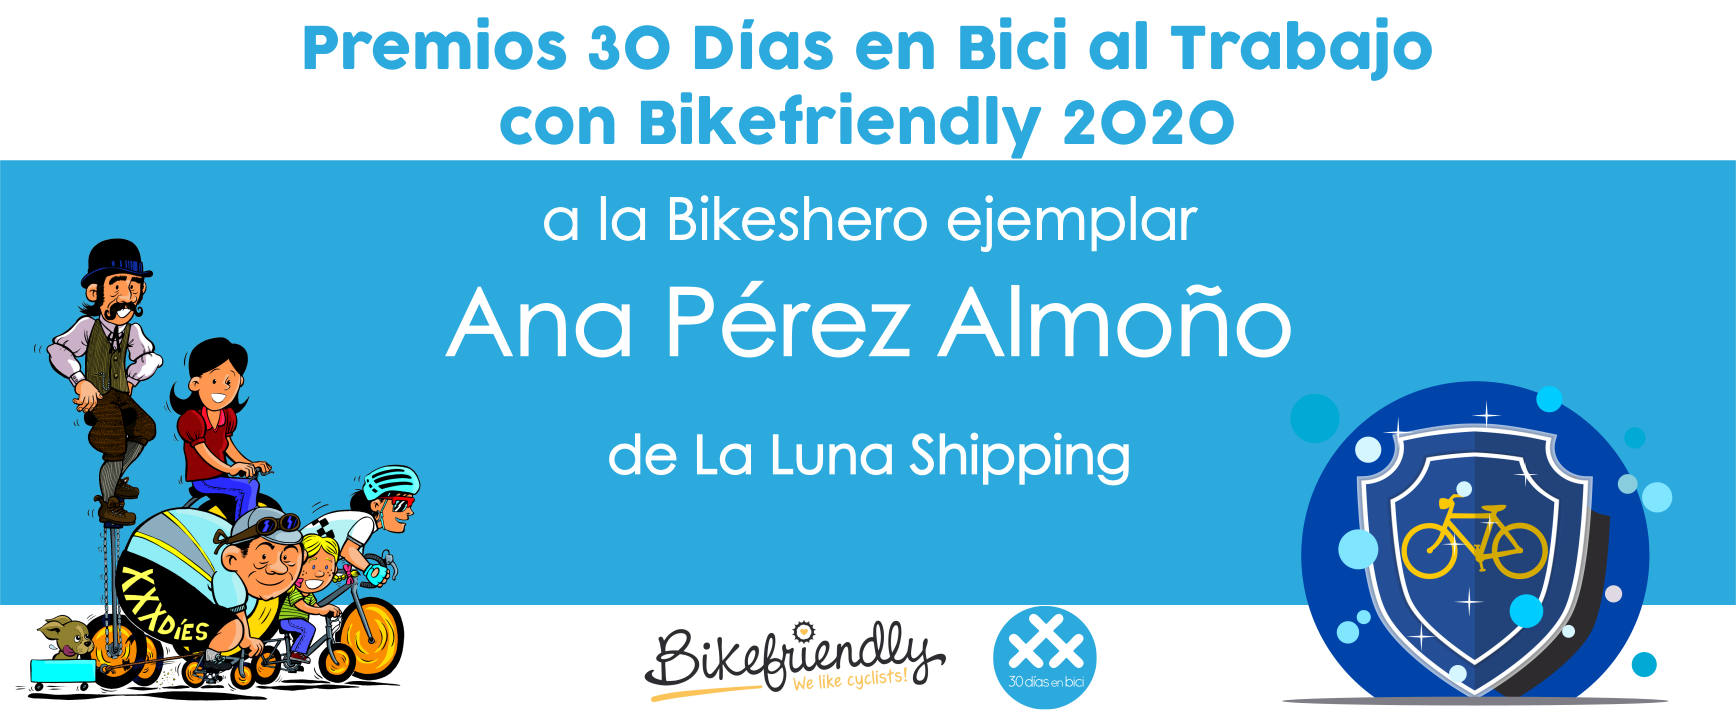 Premio Ana P. Almoño Bikeshero 2020 - Premios 30 Días en Bici al Trabajo con Bikefriendly 2020